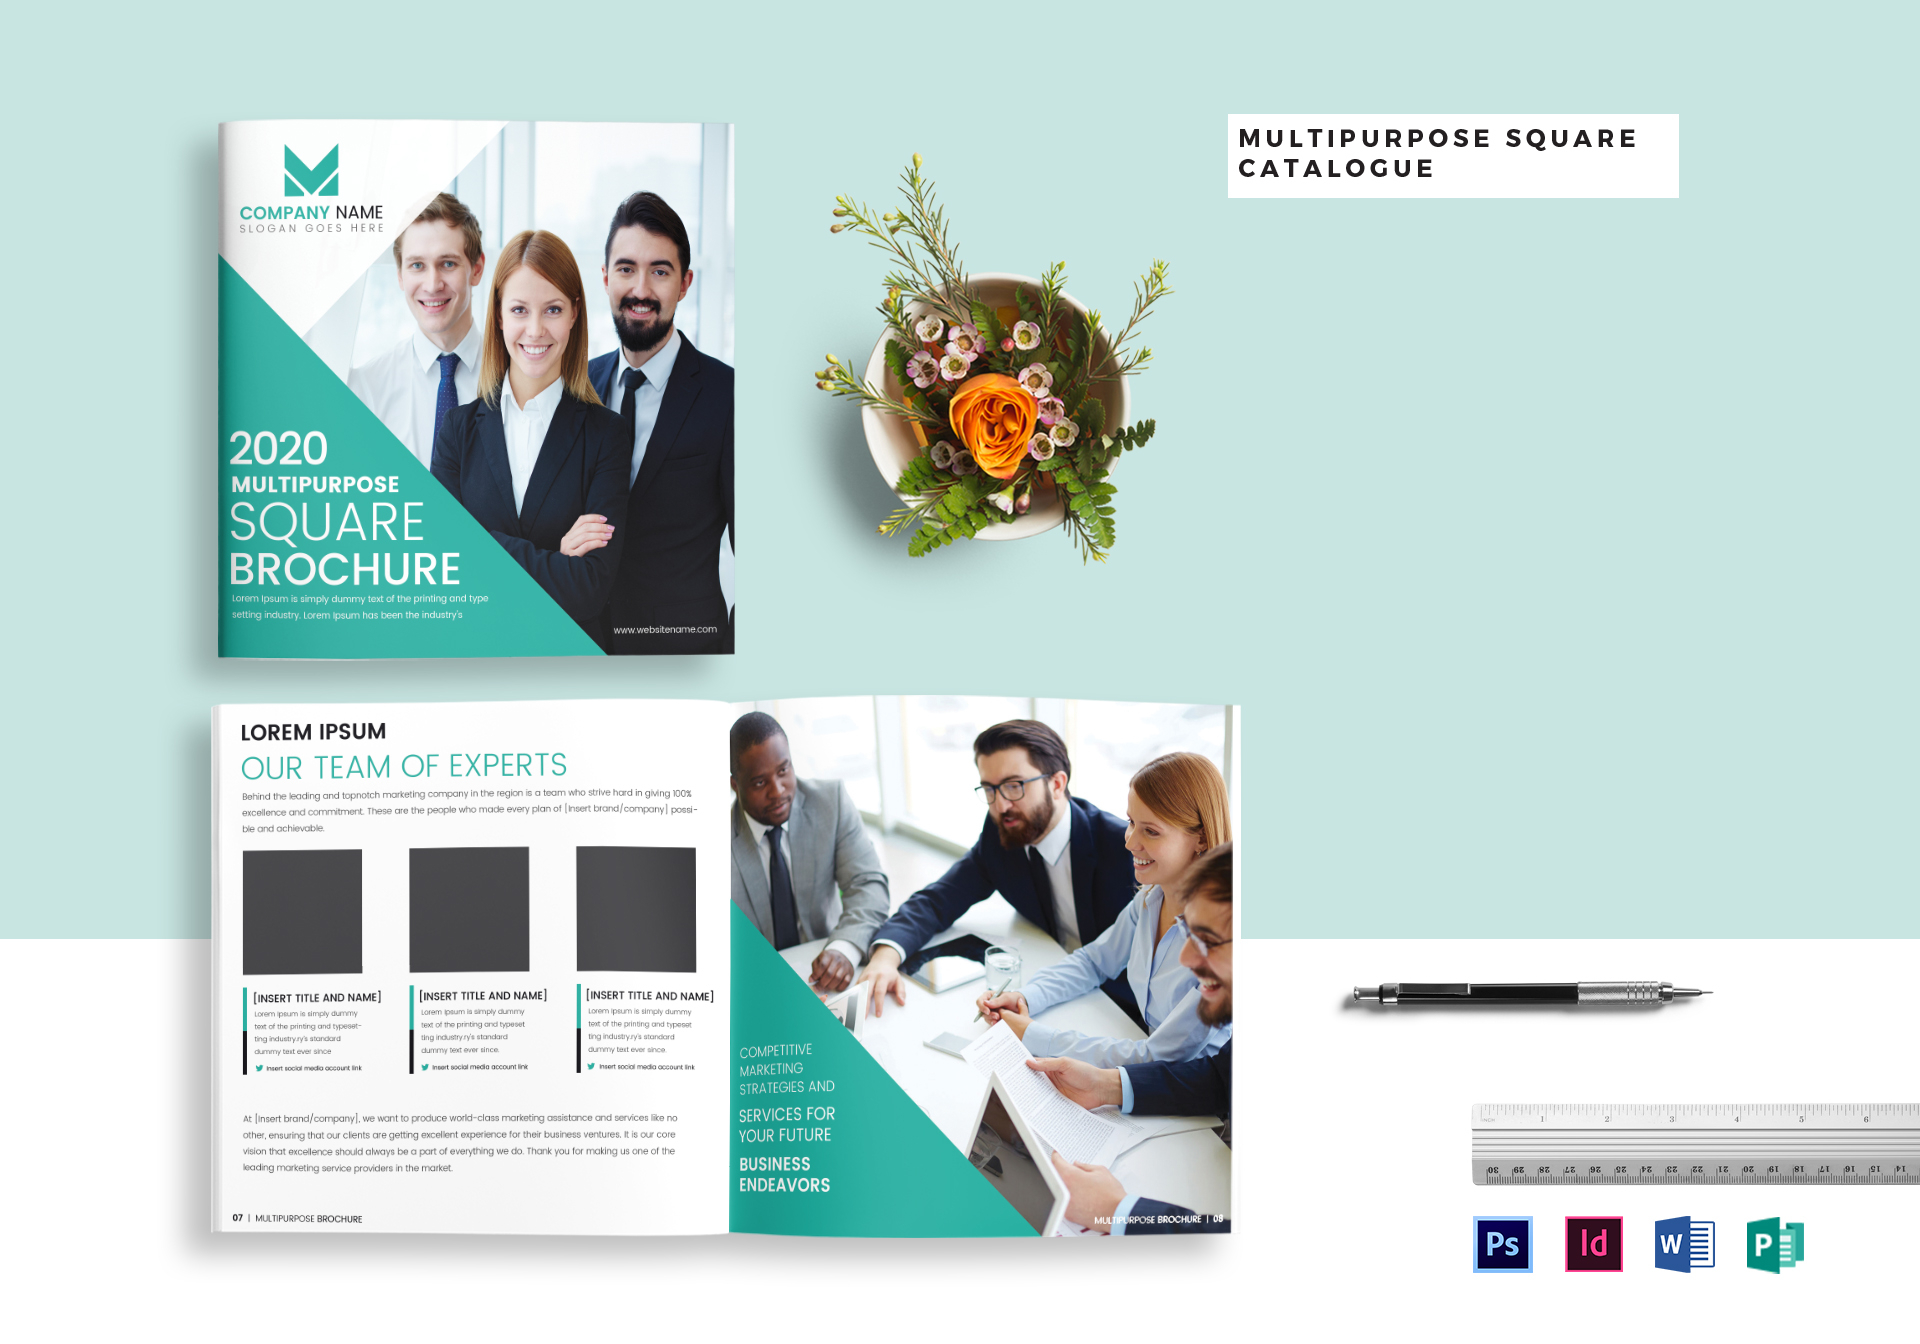 Multipurpose Square Brochure Catalog Template In Psd Word